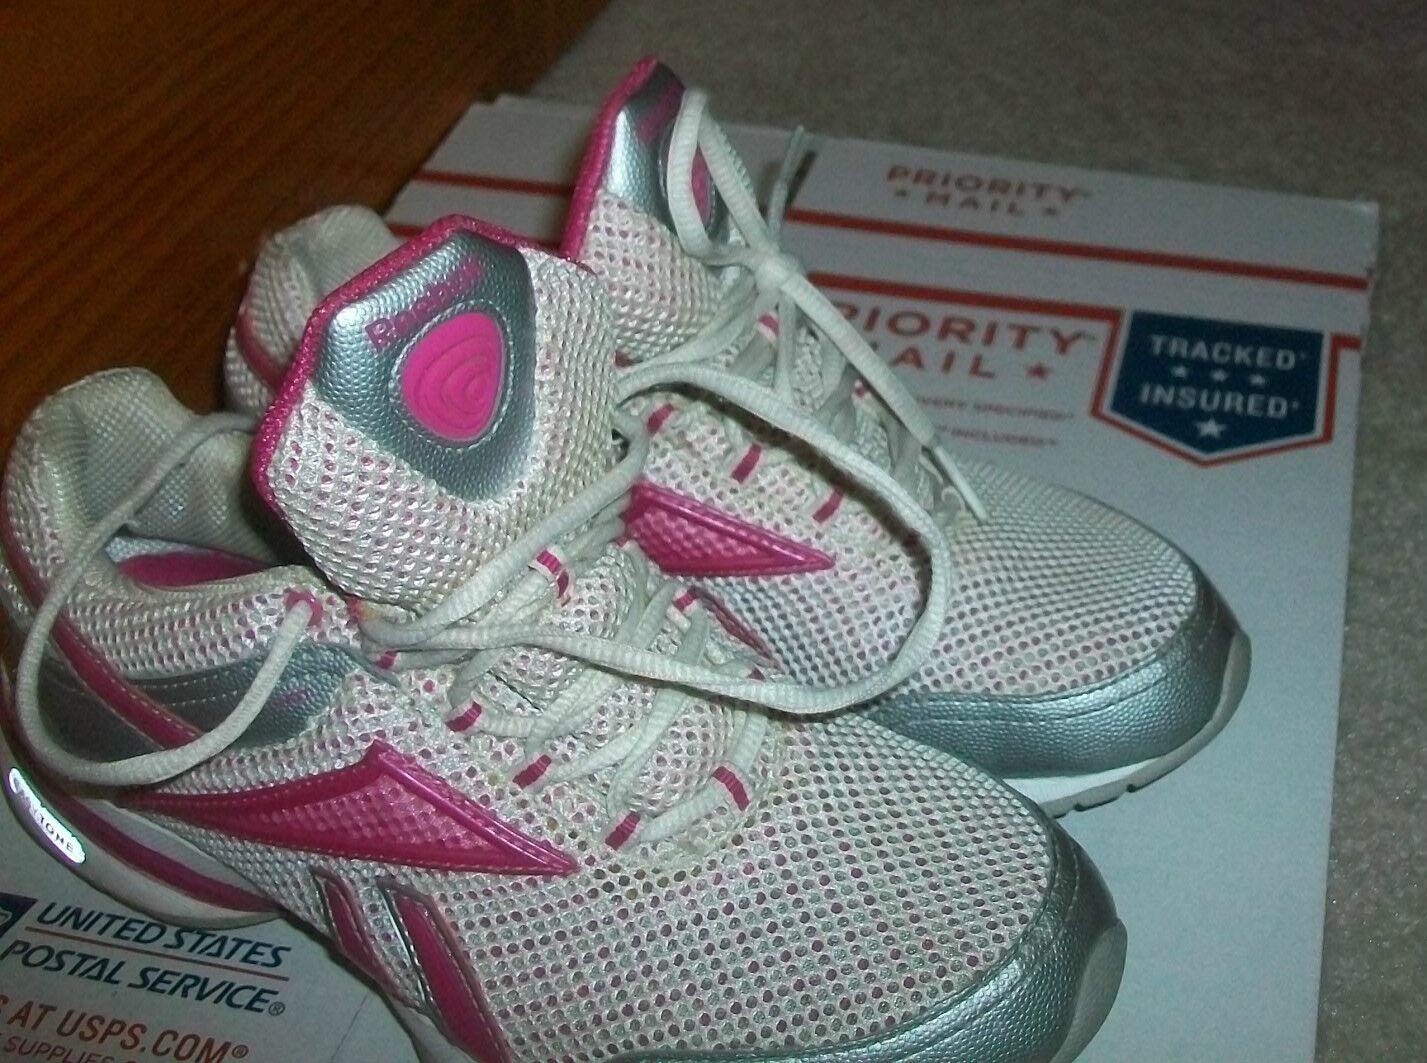 Reebok femmes Easy Tone Reenew Reenew Reenew Walking Running chaussures Taille 6 rose blanc c6c06a